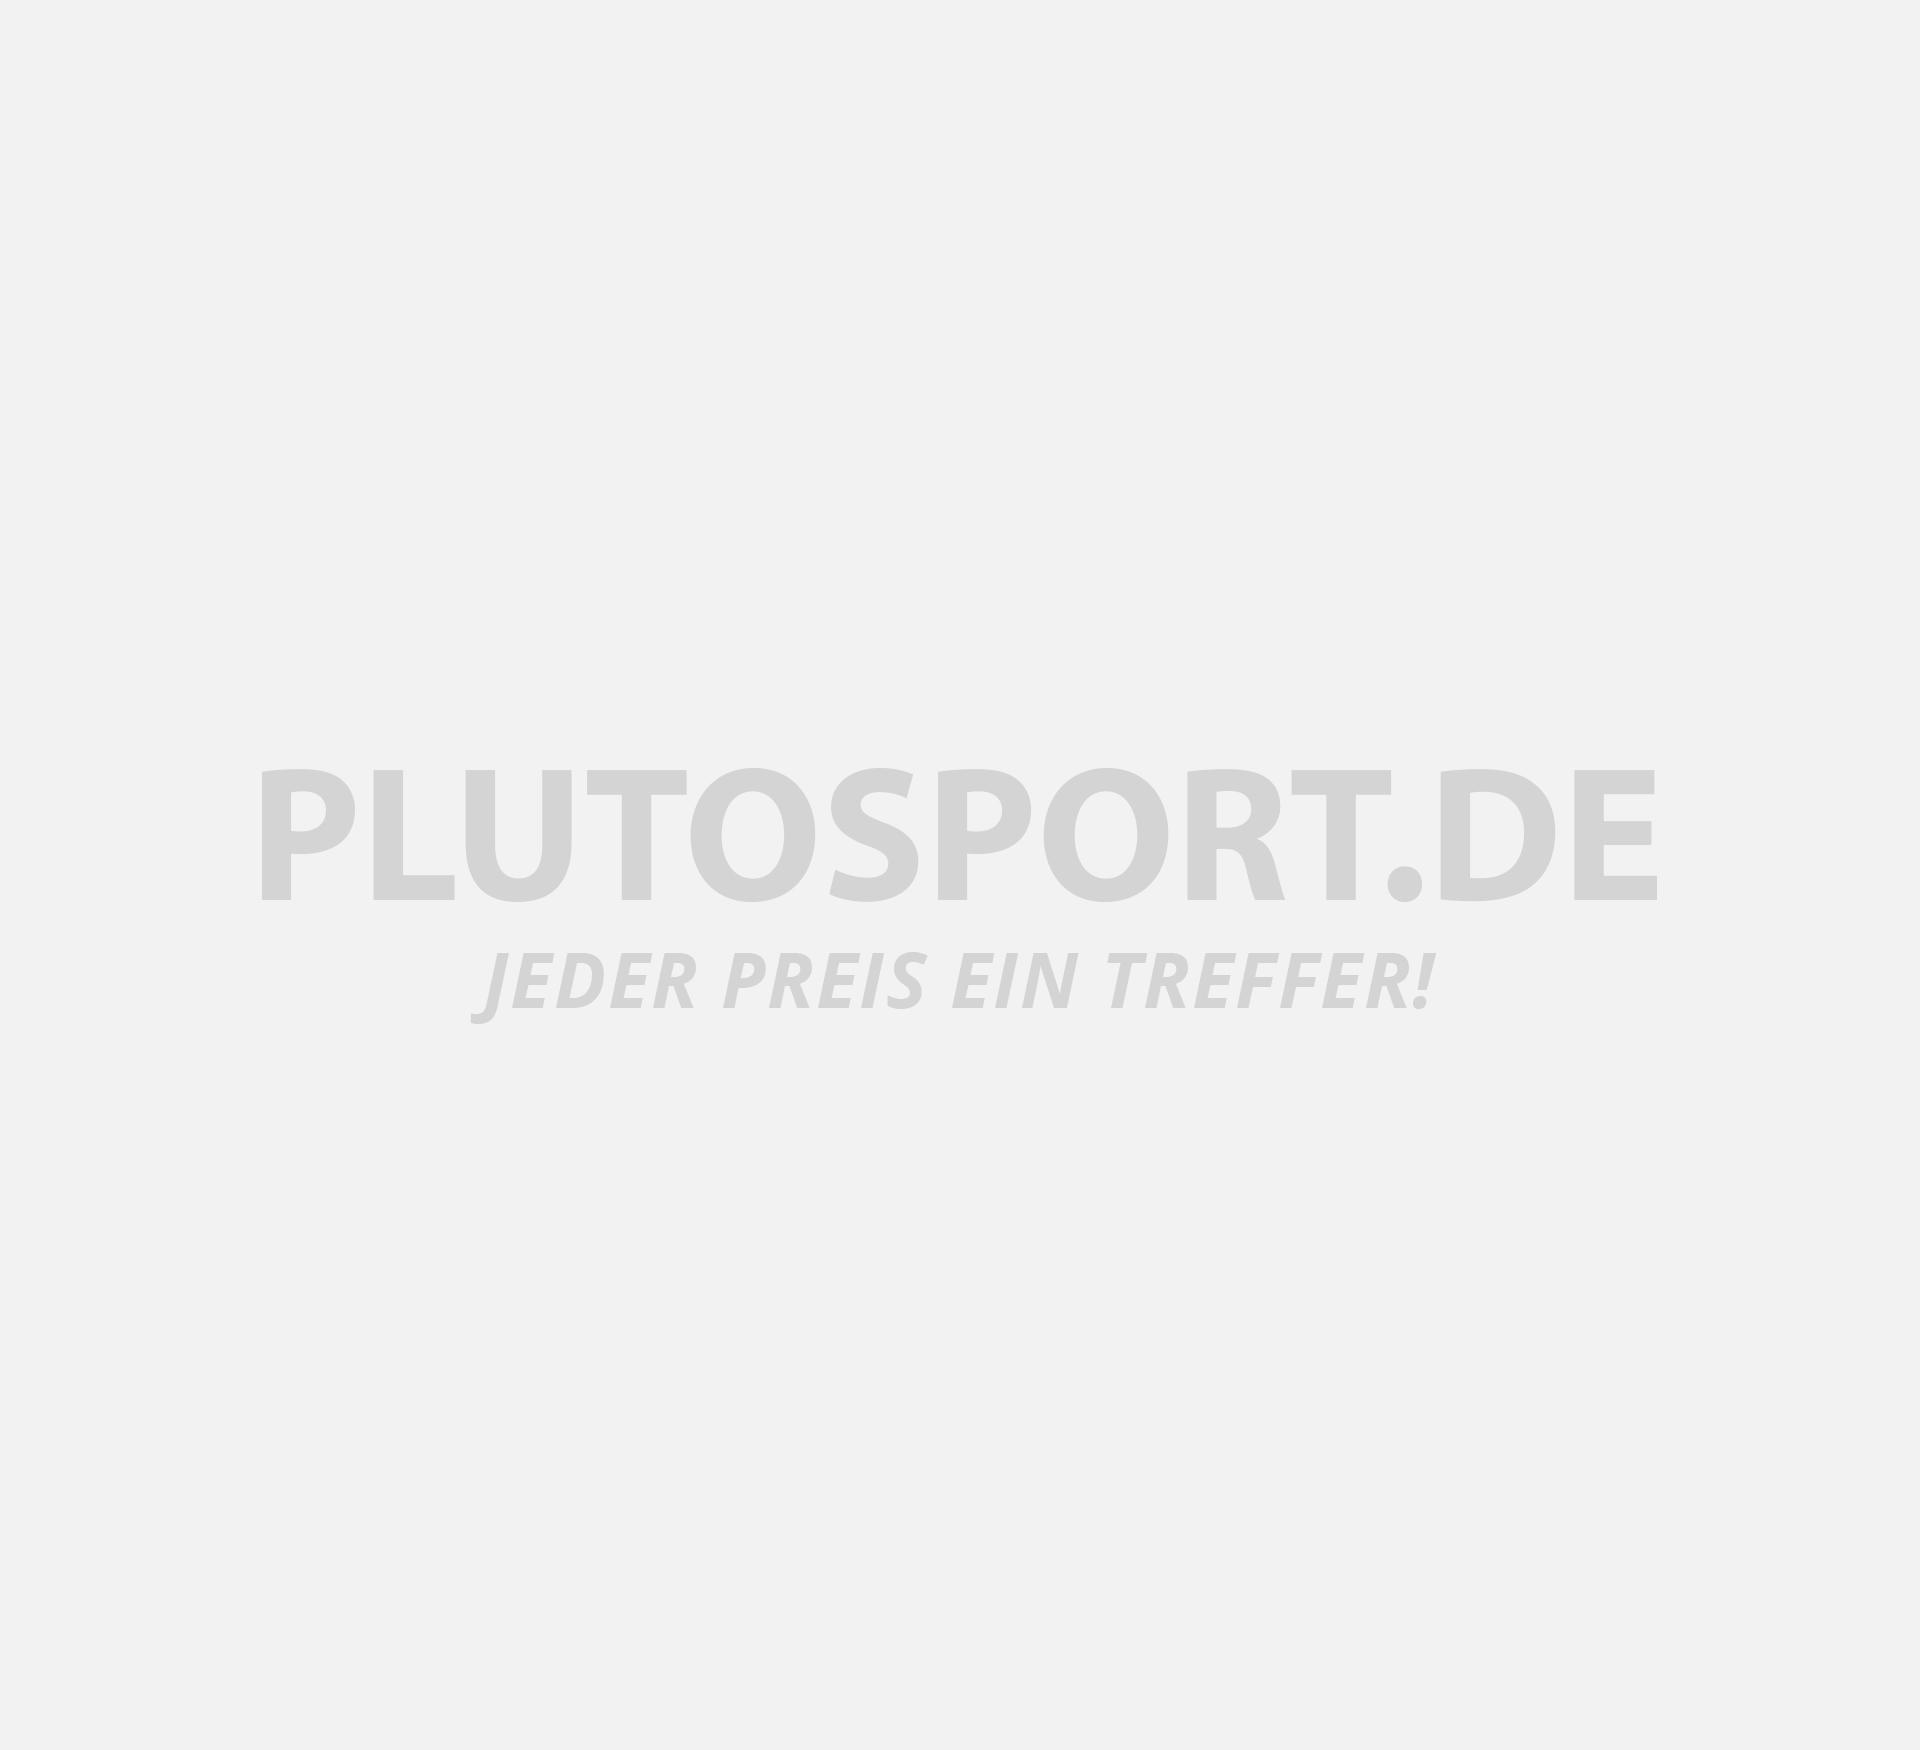 Reusch Attrakt Grip Evolution Finger Support Torwarthandschuhe Senior